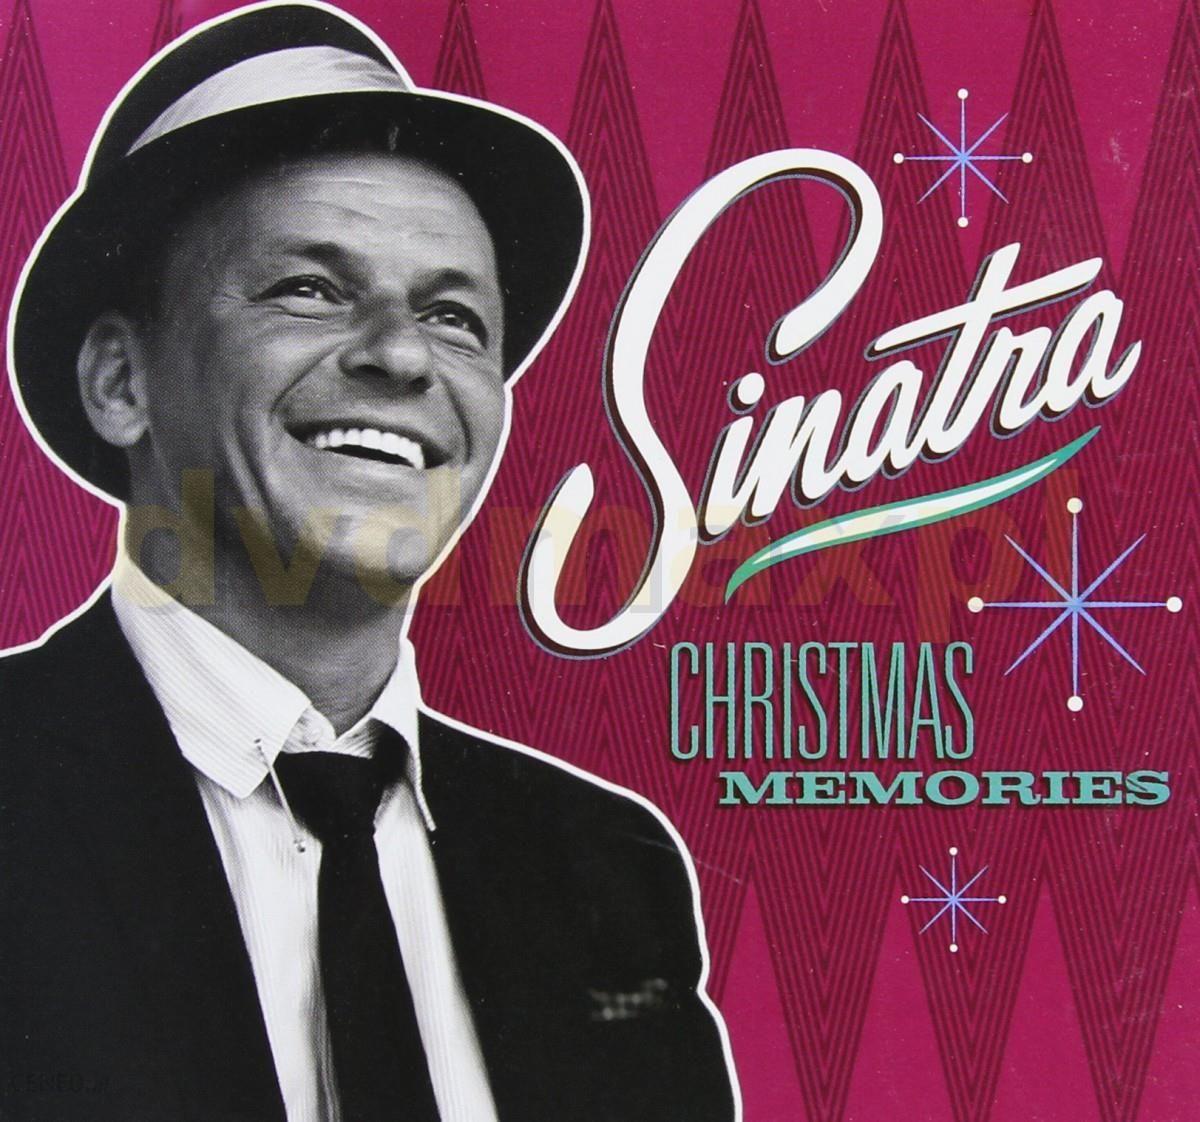 Frank Sinatra Christmas.Plyta Kompaktowa Frank Sinatra Christmas Memories Cd Ceny I Opinie Ceneo Pl